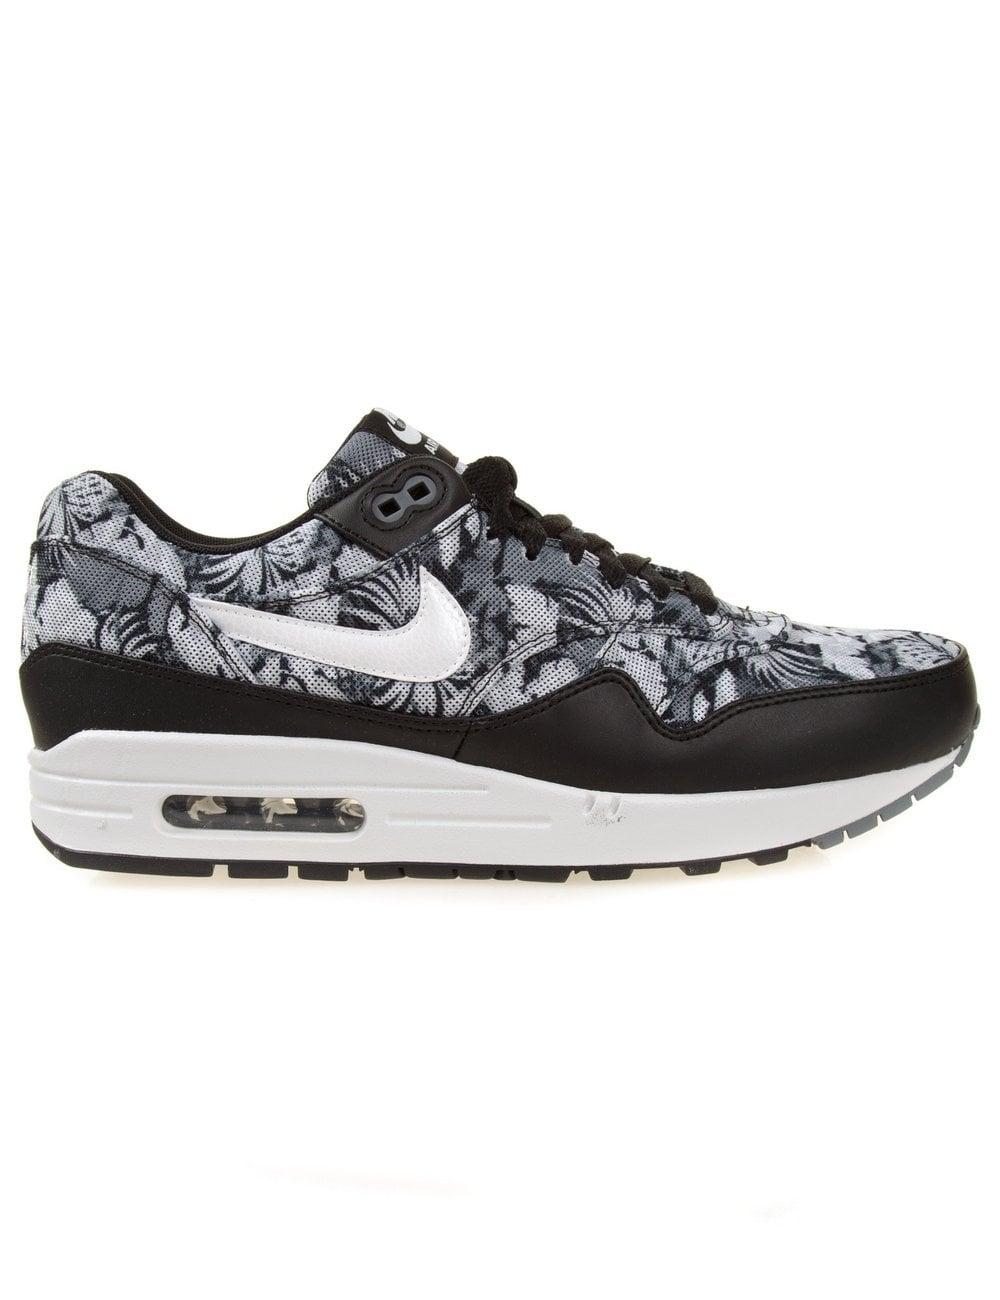 Nike Air Max 1 GPX - Black White Grey - Footwear from Fat Buddha ... 681106d38688